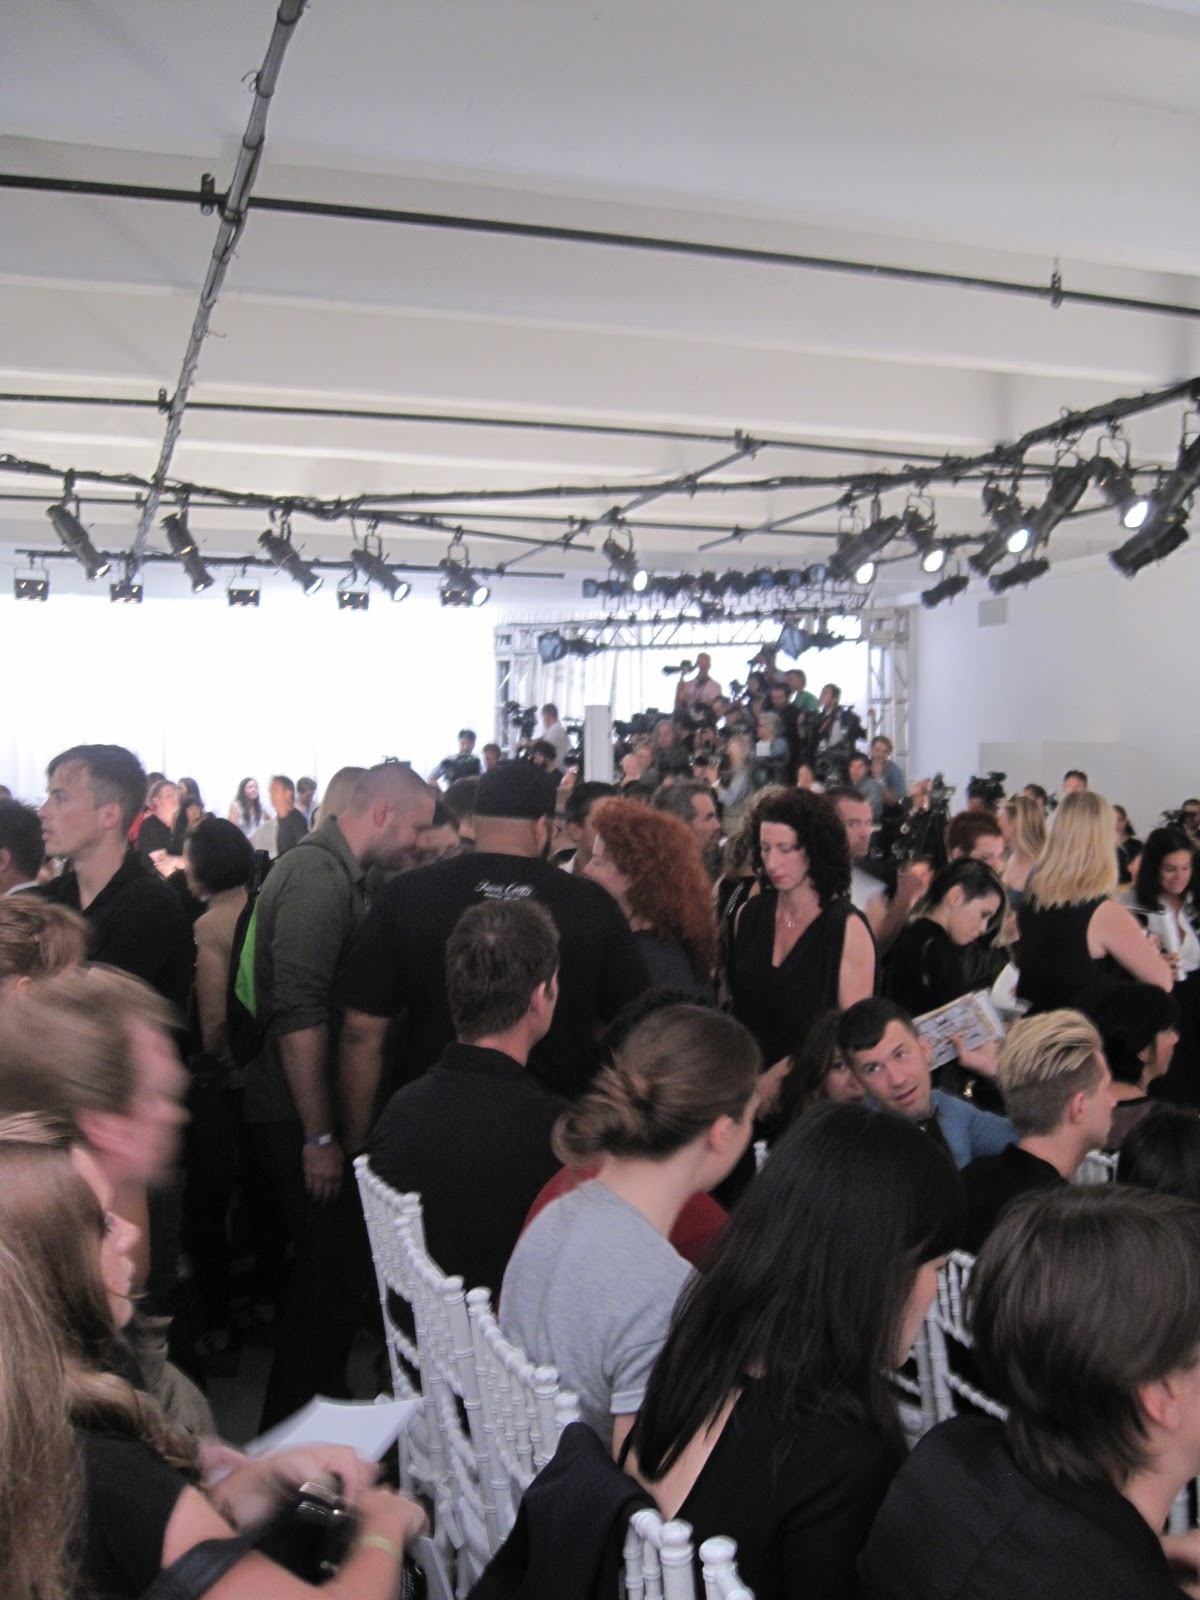 Jason Wu S/S Show, Brizo New York Fashion Week